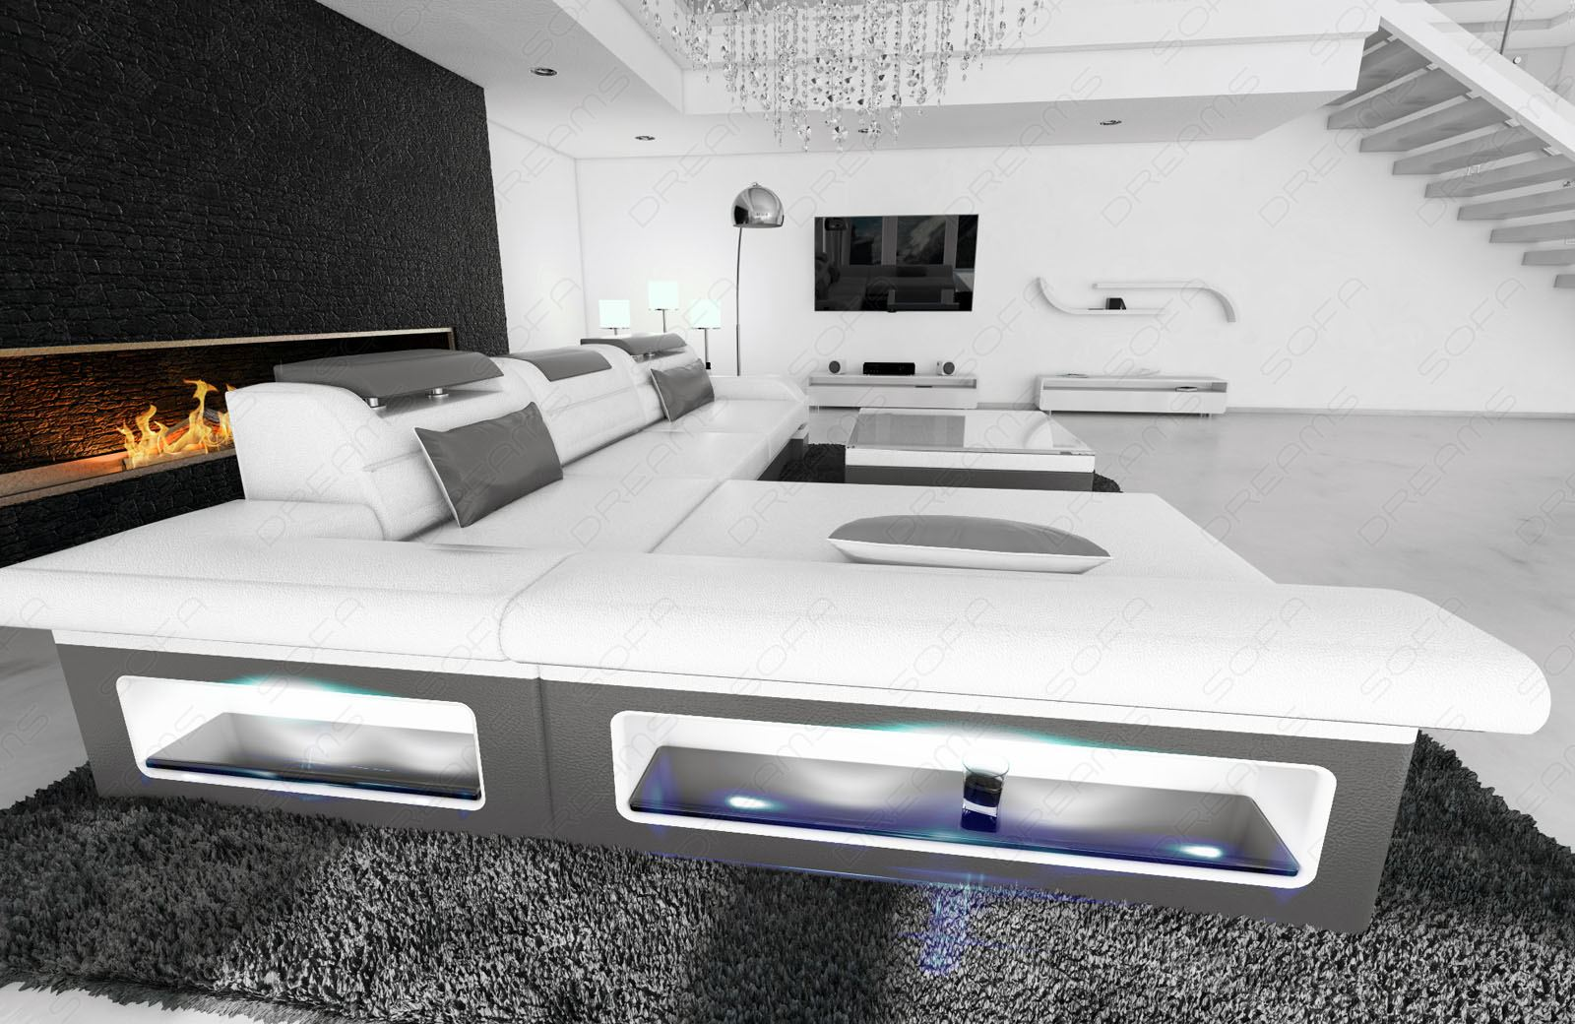 ledercouch design ecksofa monza l form ottomane weiss grau. Black Bedroom Furniture Sets. Home Design Ideas